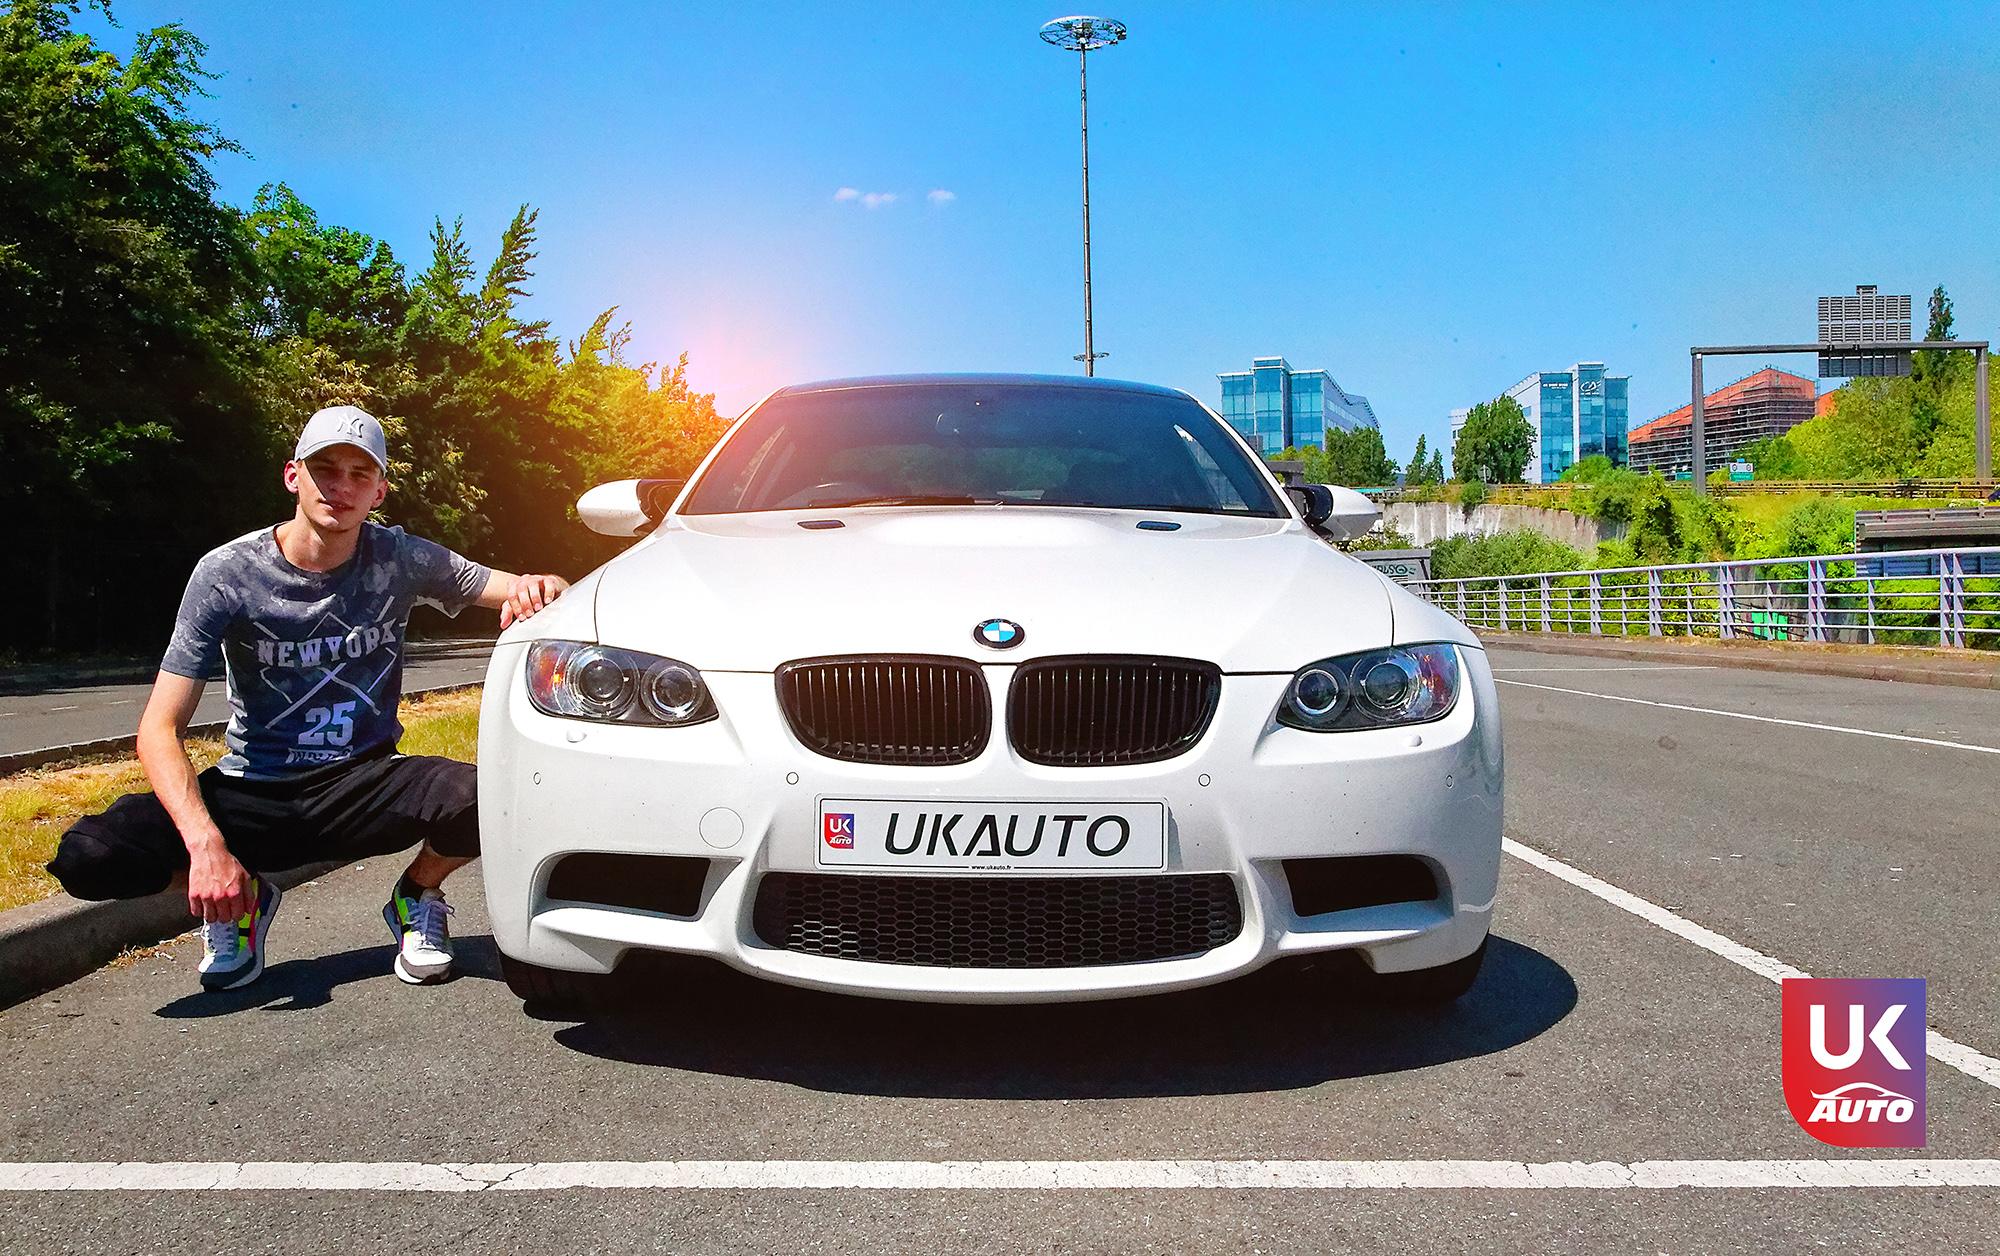 BMW m3 E92 import auto mandataire angleterre uk londres bmw leboncoin achat angleterre bmw voiture anglaise auto rhd e92 uk auto16 - Felecitation a Clement pour cette BMW M3 E92 COUPE RHD PACK CARBON BMW ANGLETERRE VOITURE UK